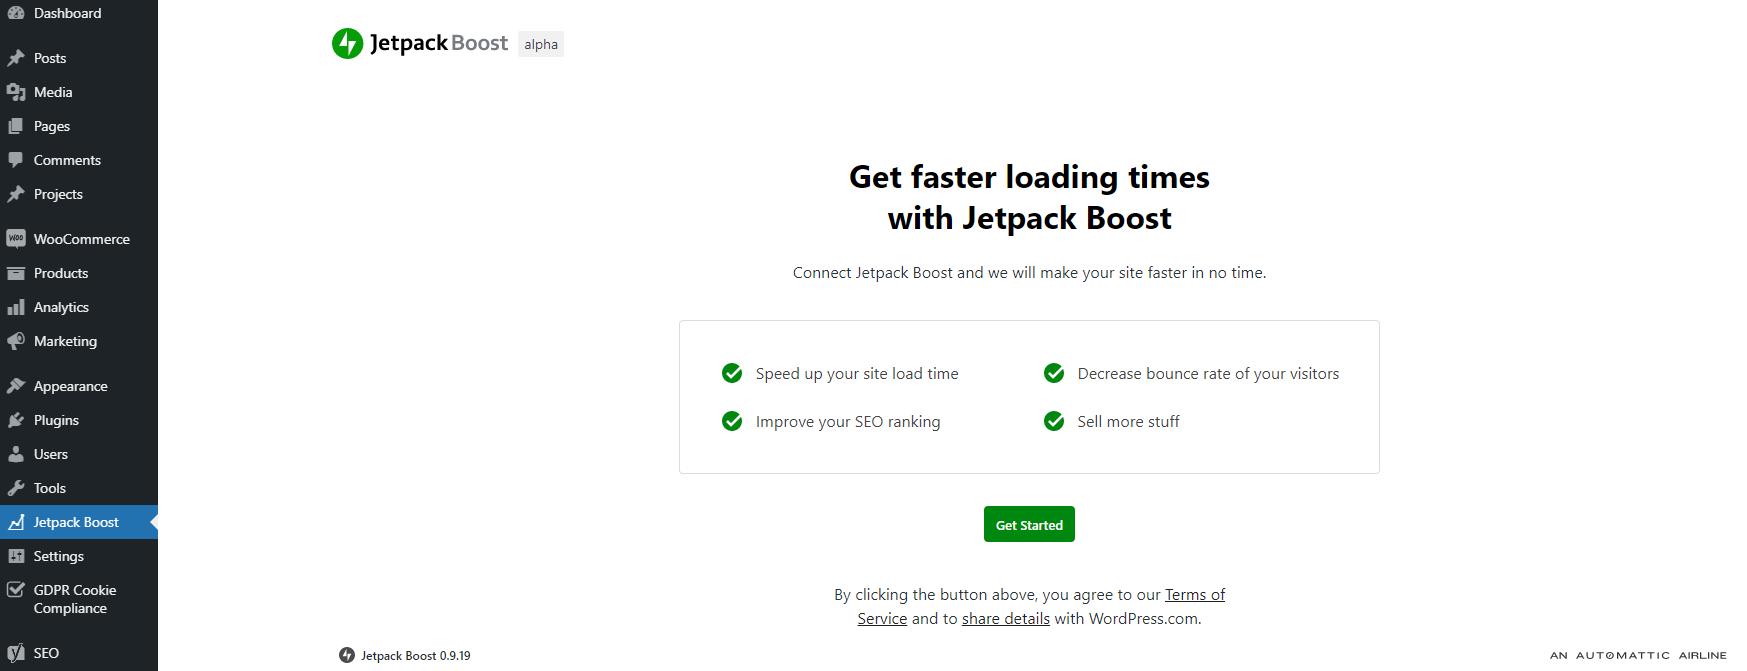 Jetpack boost first steps